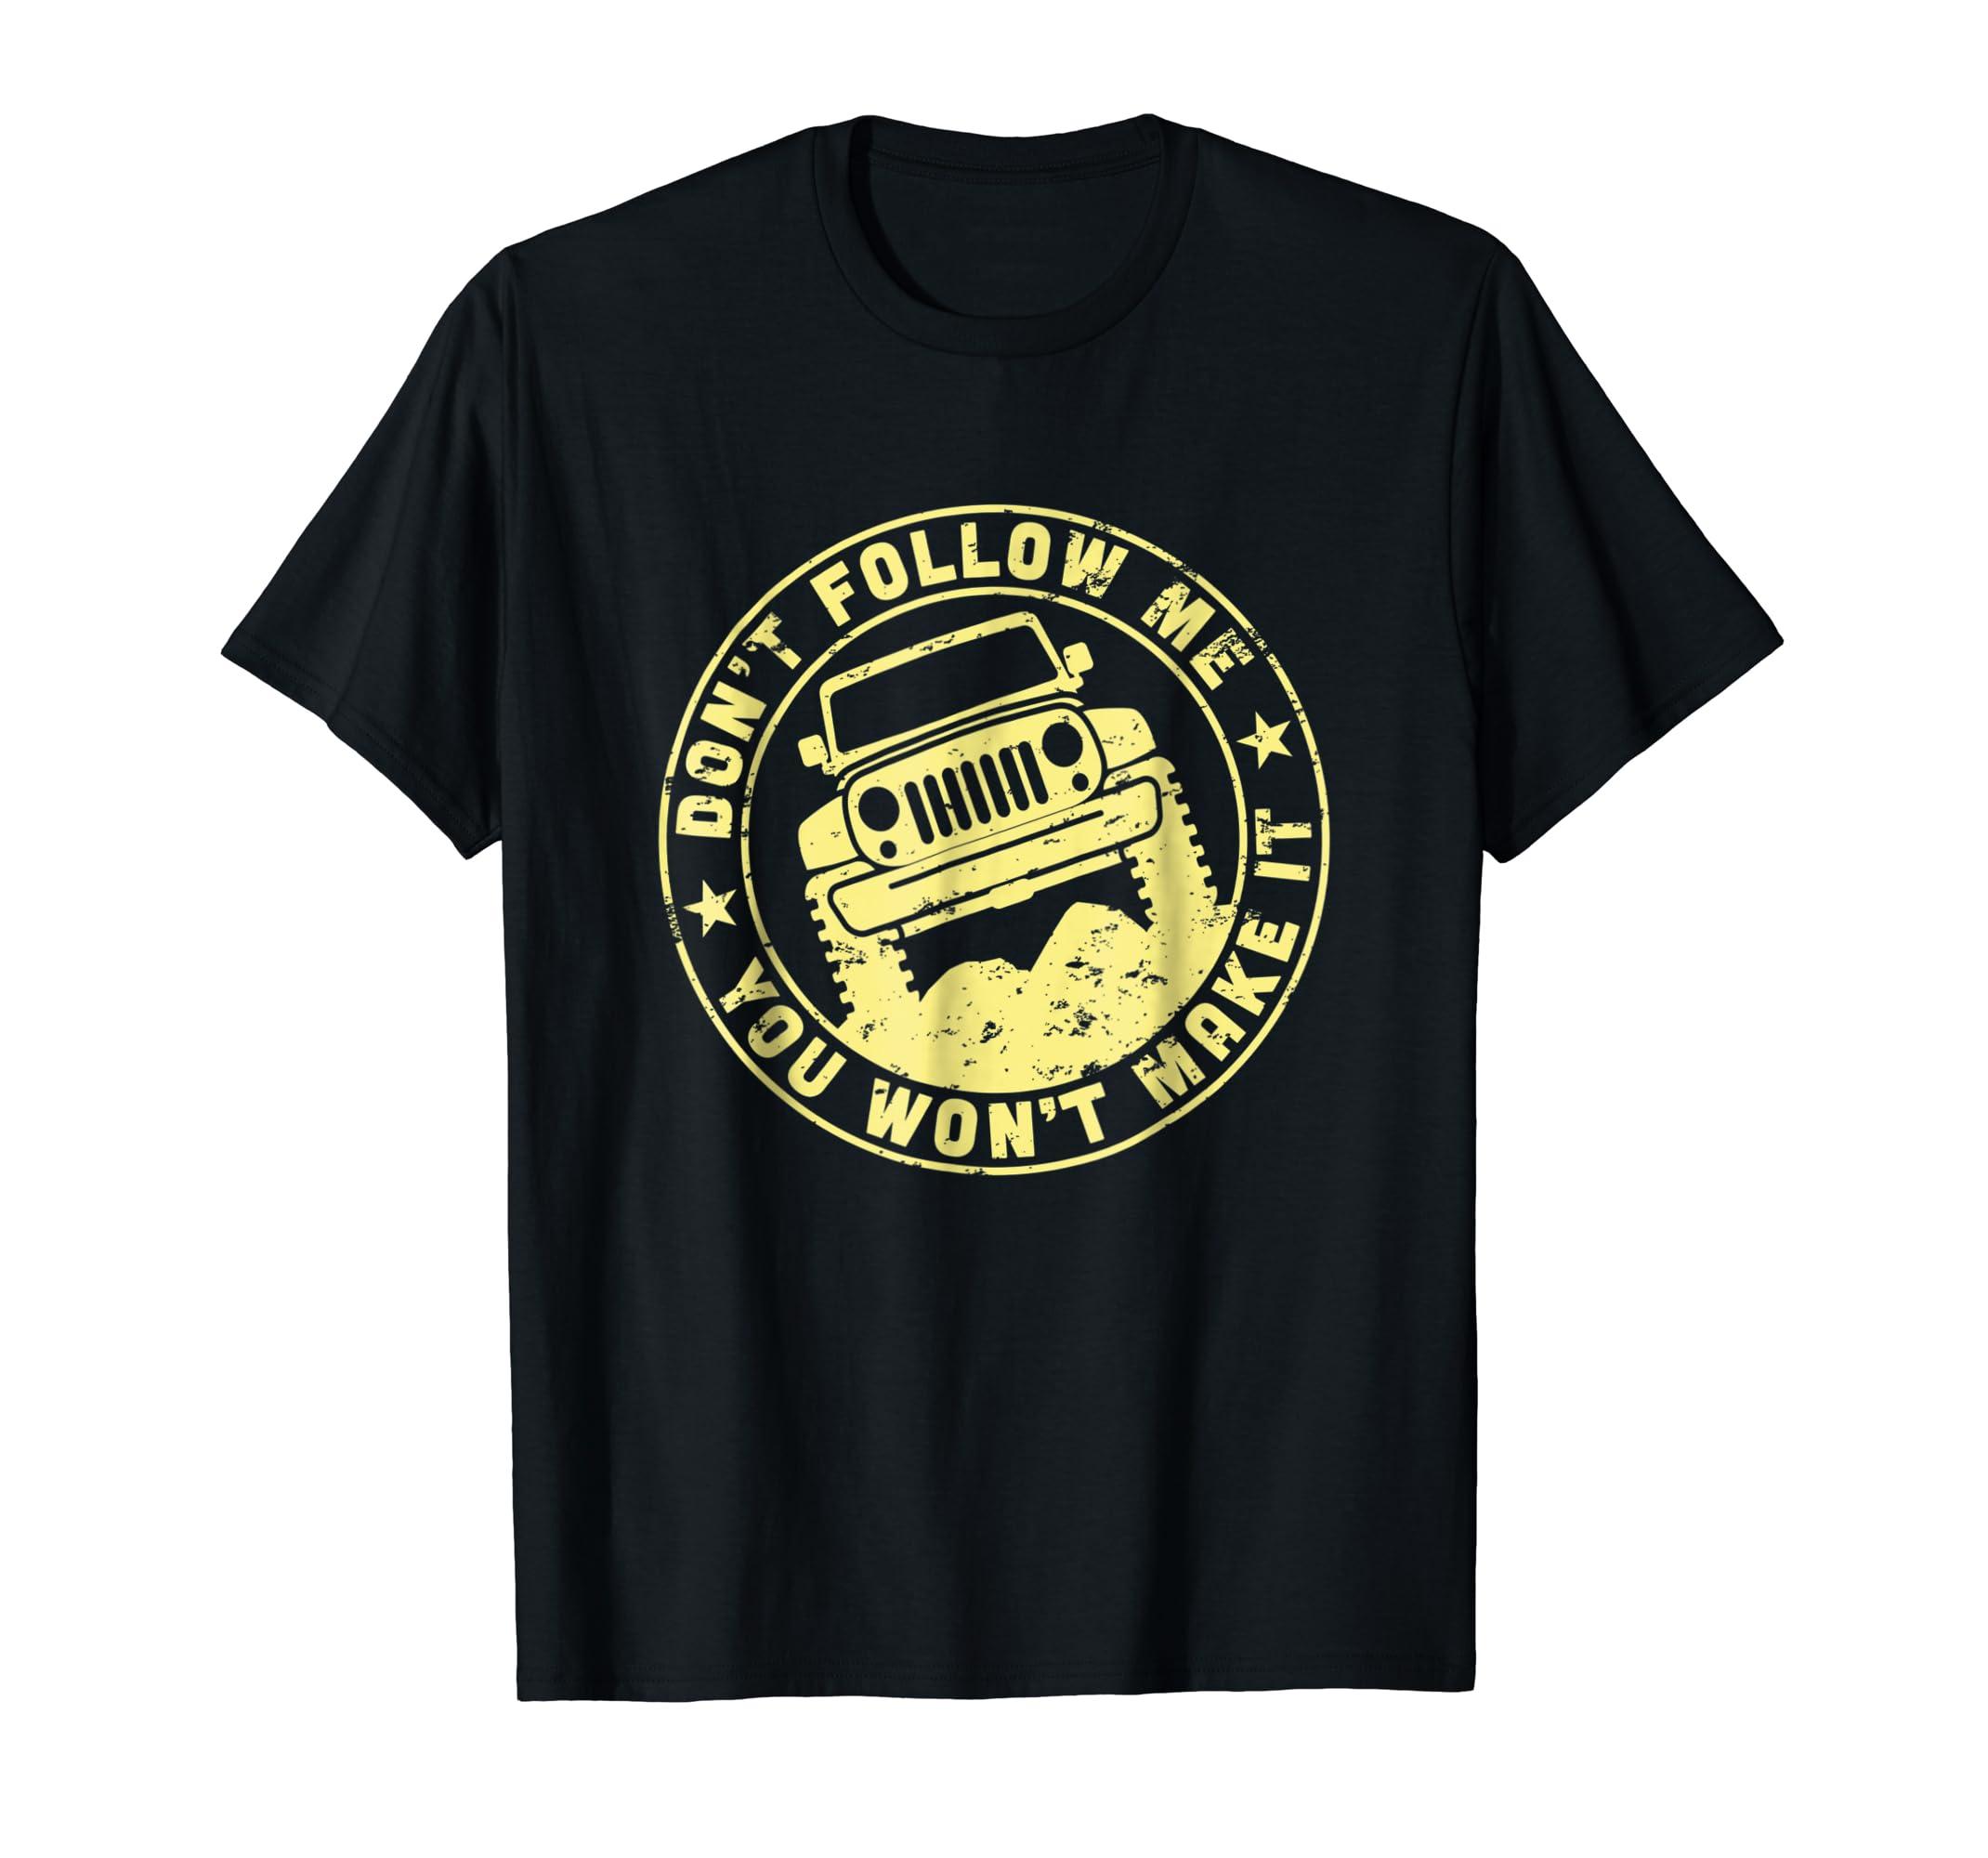 0c0507ff Amazon.com: Don't Follow Me You Won't Make It Jeep T-Shirt: Clothing